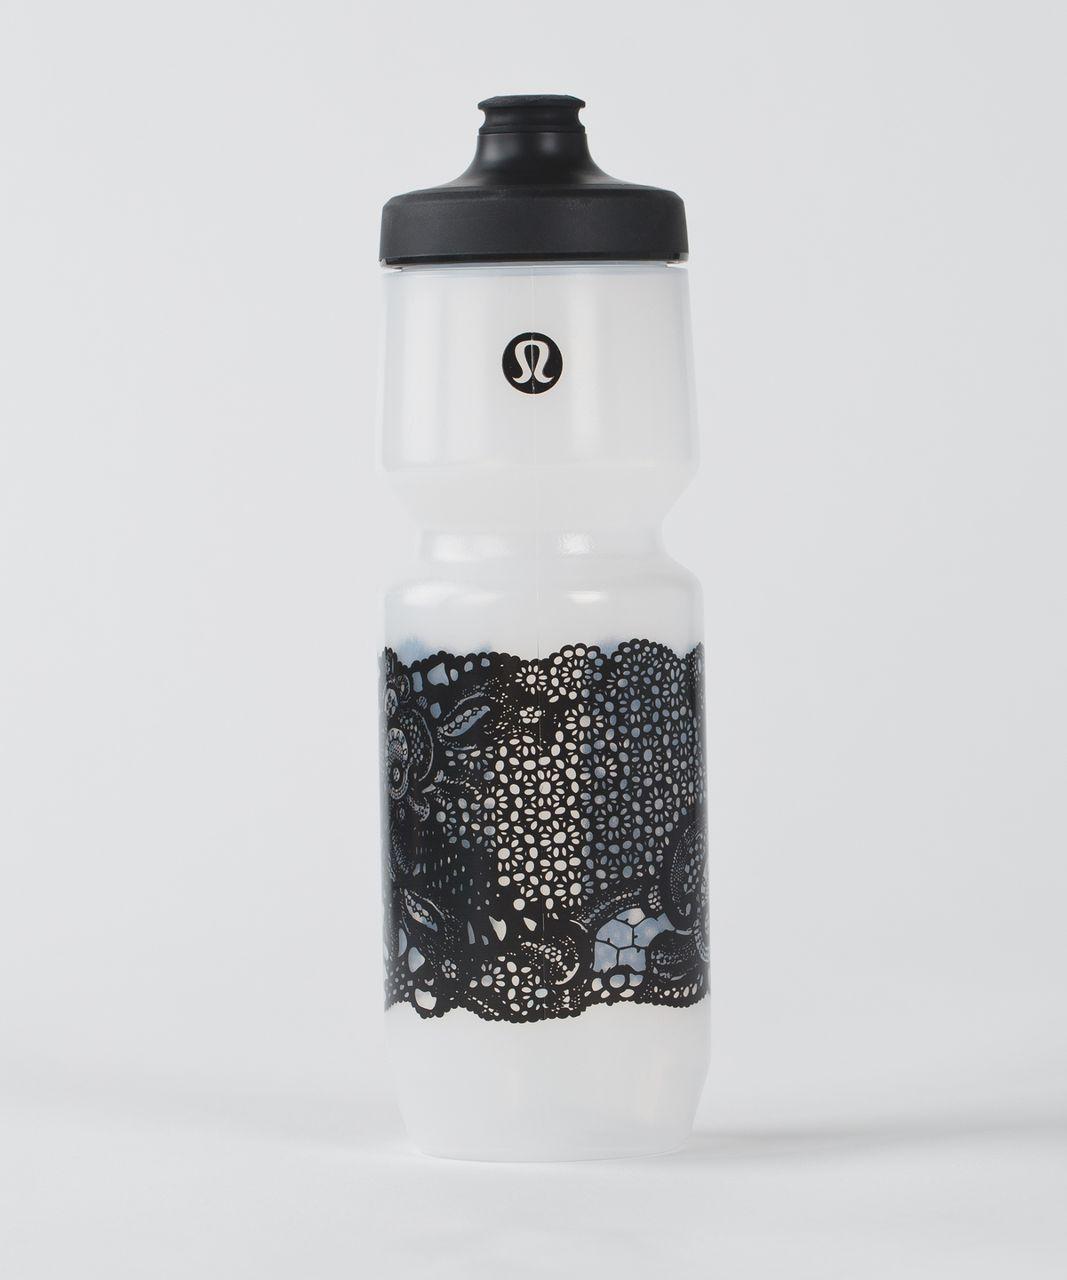 Lululemon Purist Cycling Waterbottle - Pretty Lace Purist